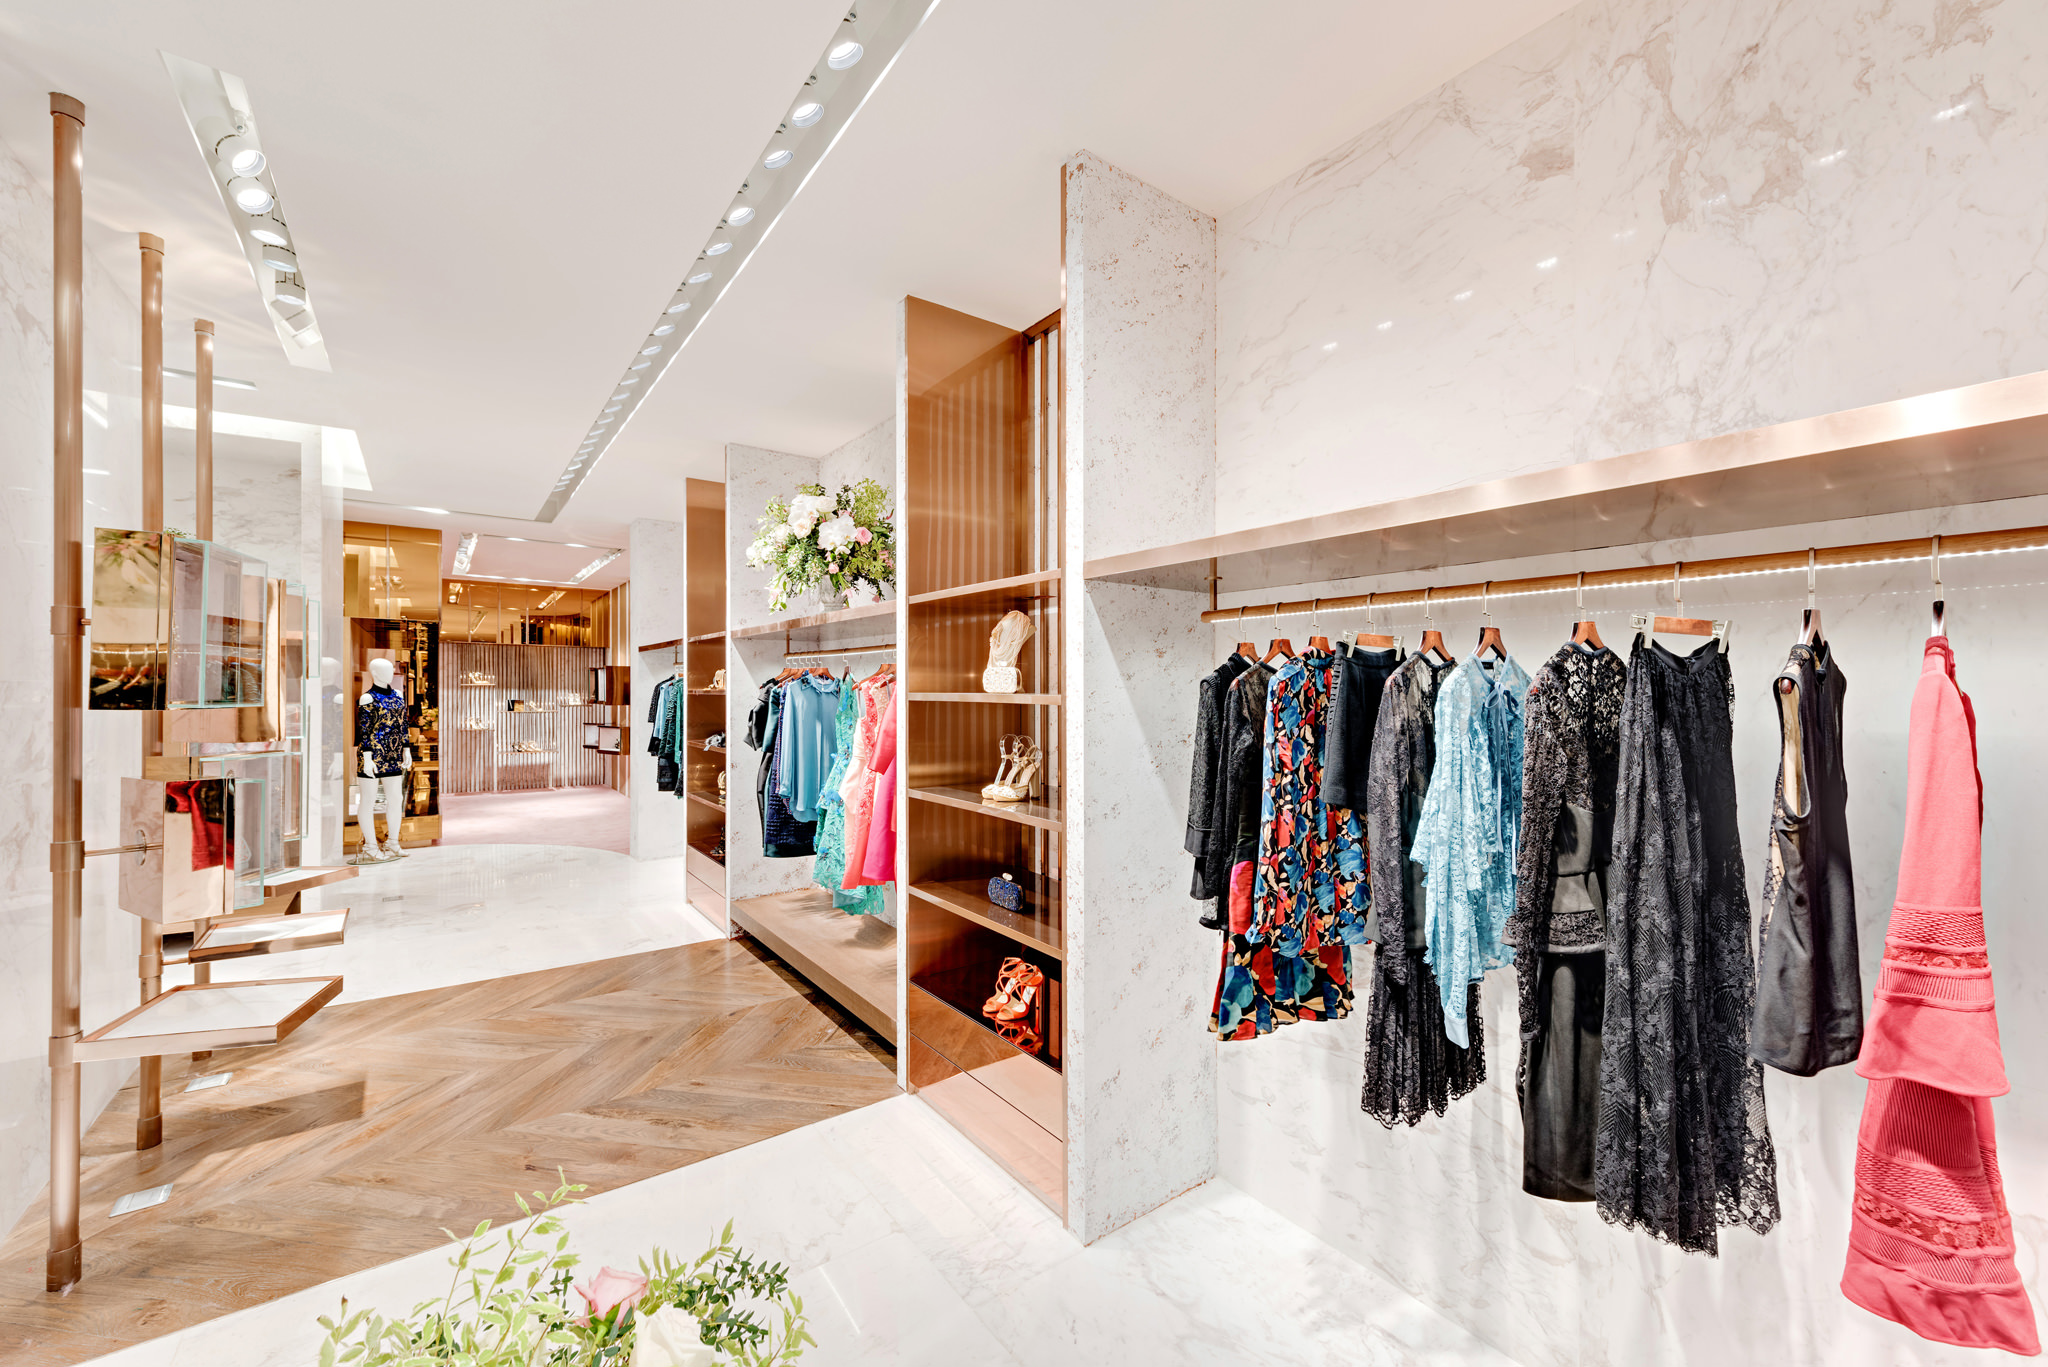 20161224 - Jacqueline - HCM - Commercial - Interior - Store - Retouch 0003.jpg